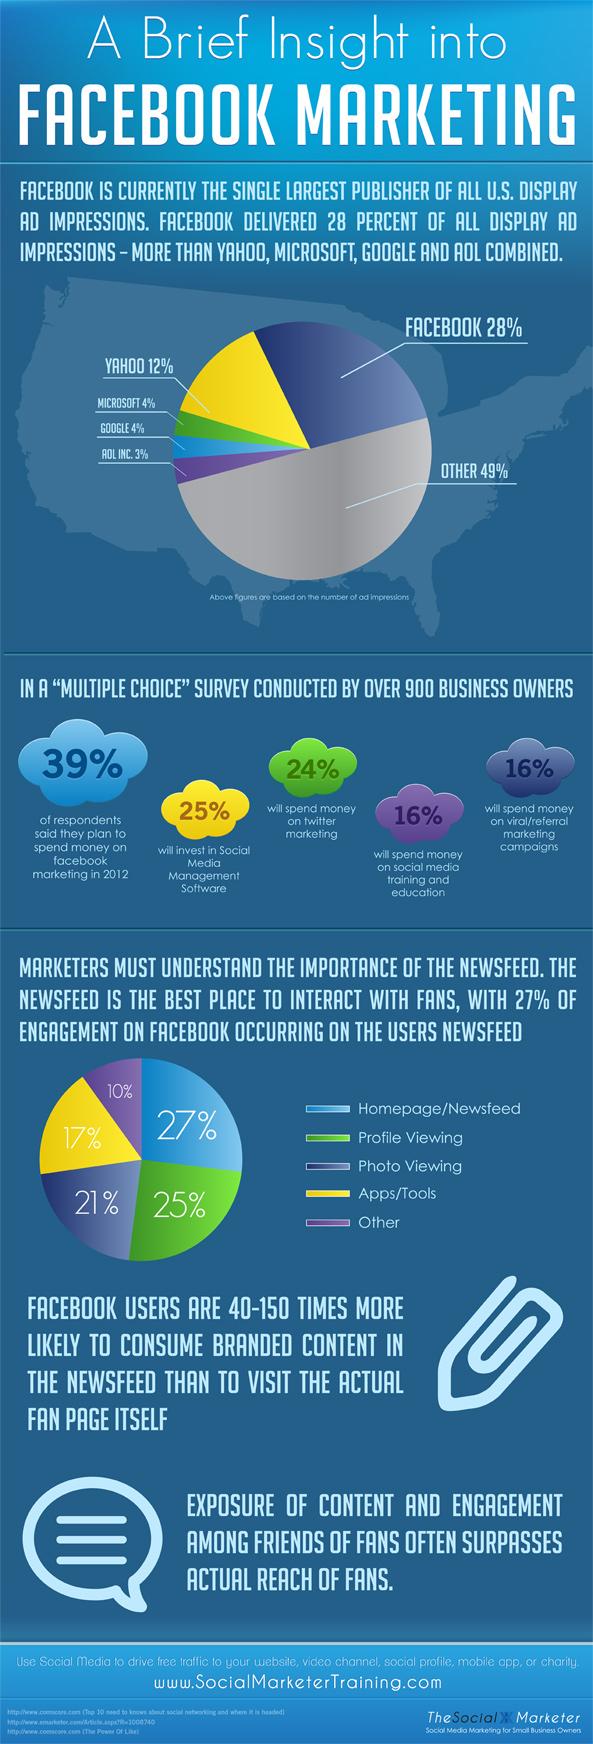 a-brief-insight-into-facebook-marketing